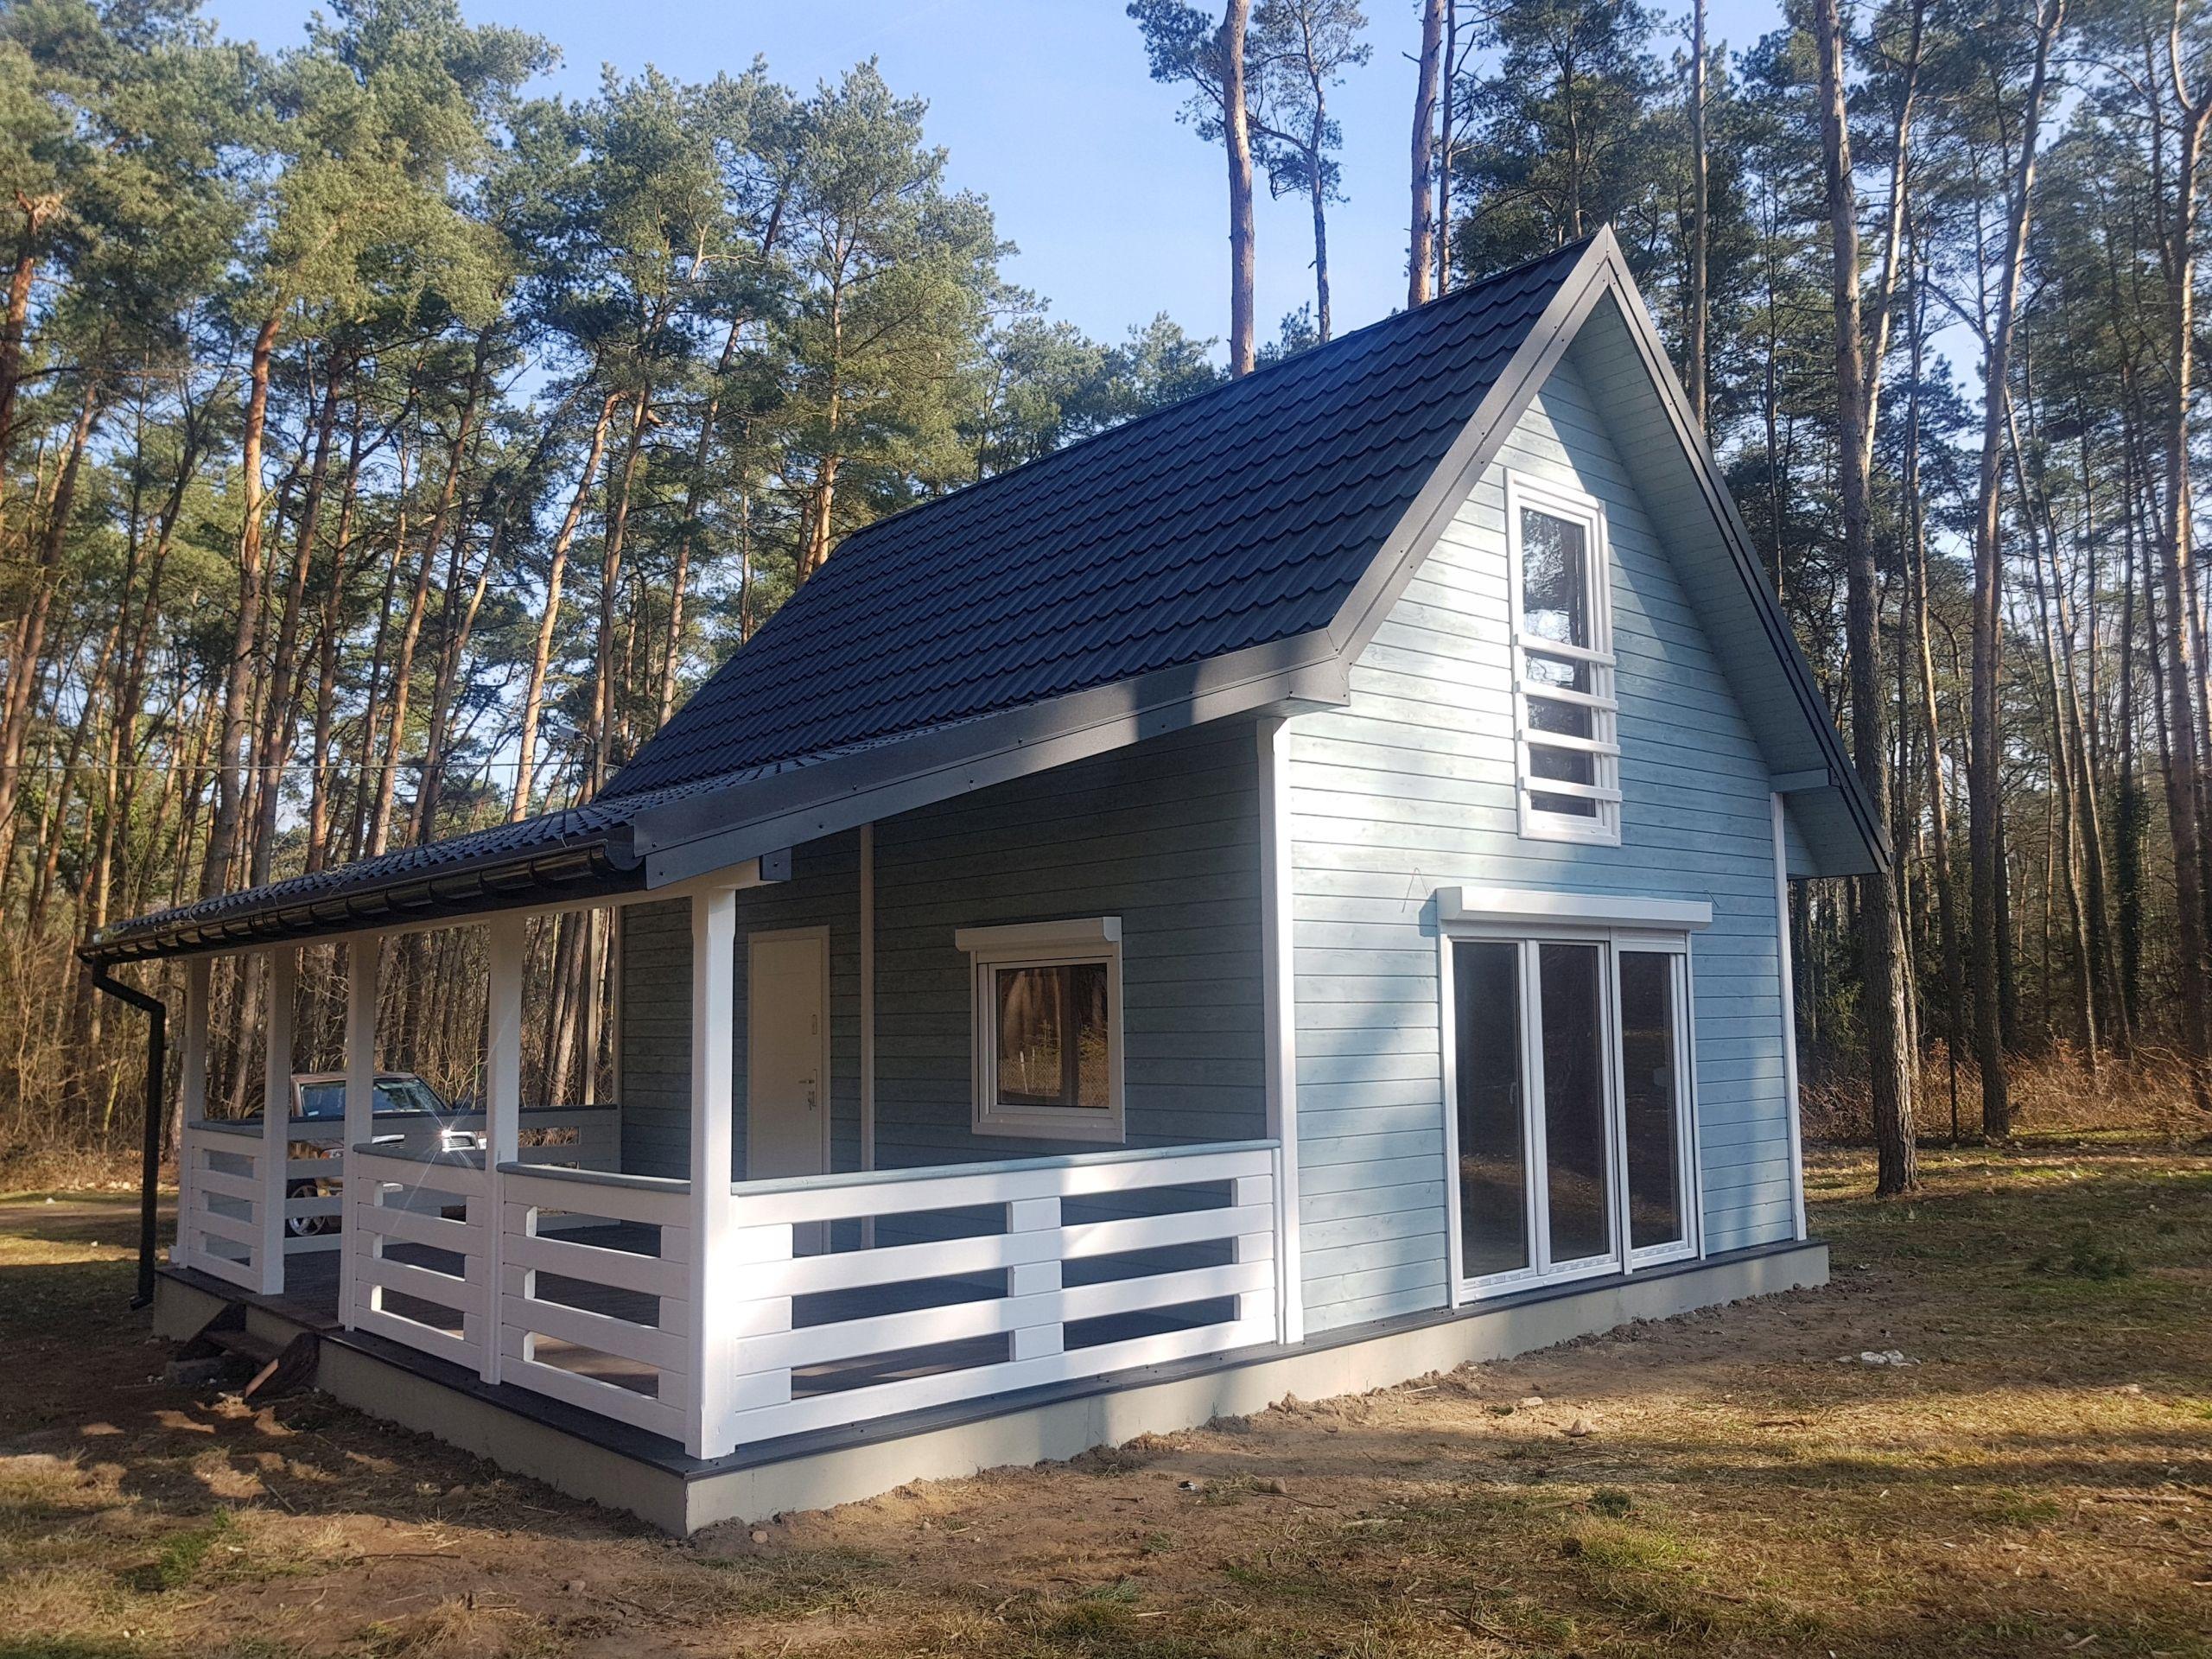 Domy Domki Z Drewna Letniskowe Bez Pozwolenia 70m2 7957930720 Allegro Pl Barn Style House Tiny House Living Tiny House